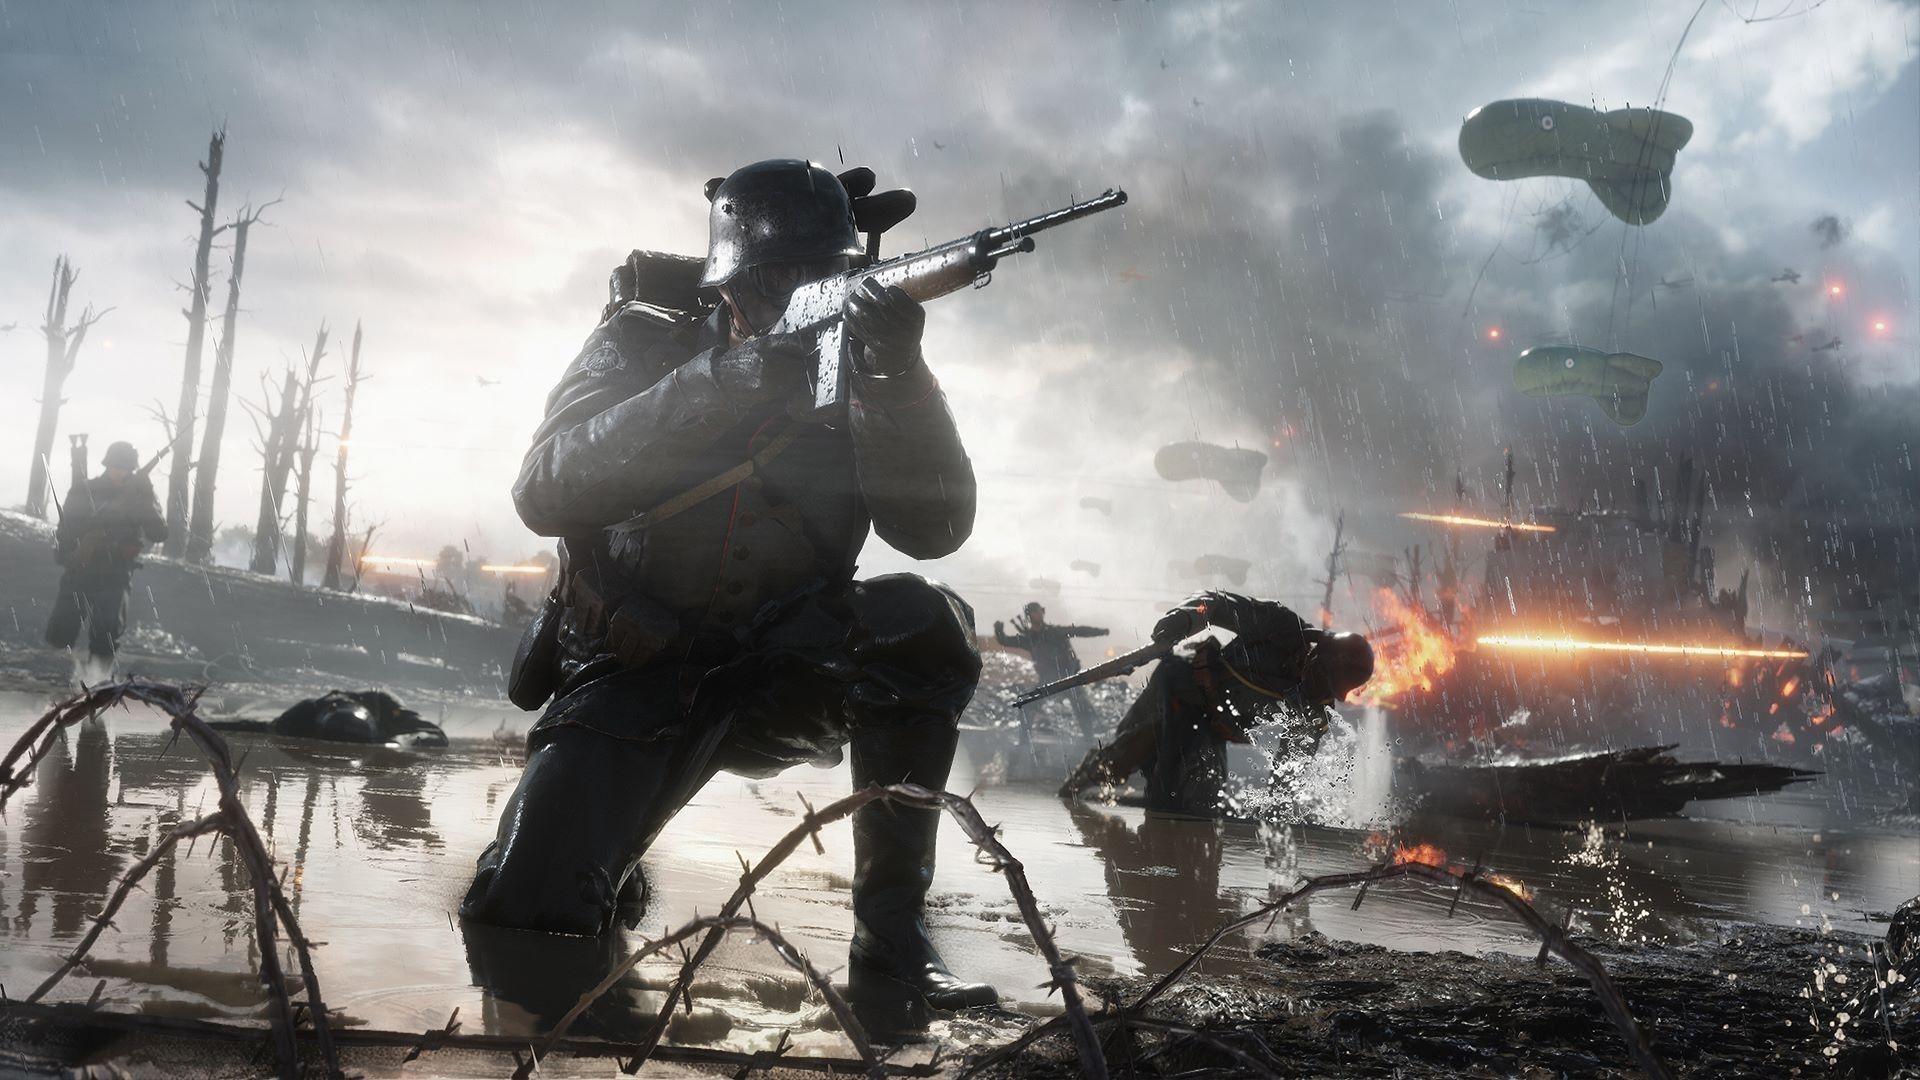 Battlefield 1 Cool HD Wallpaper